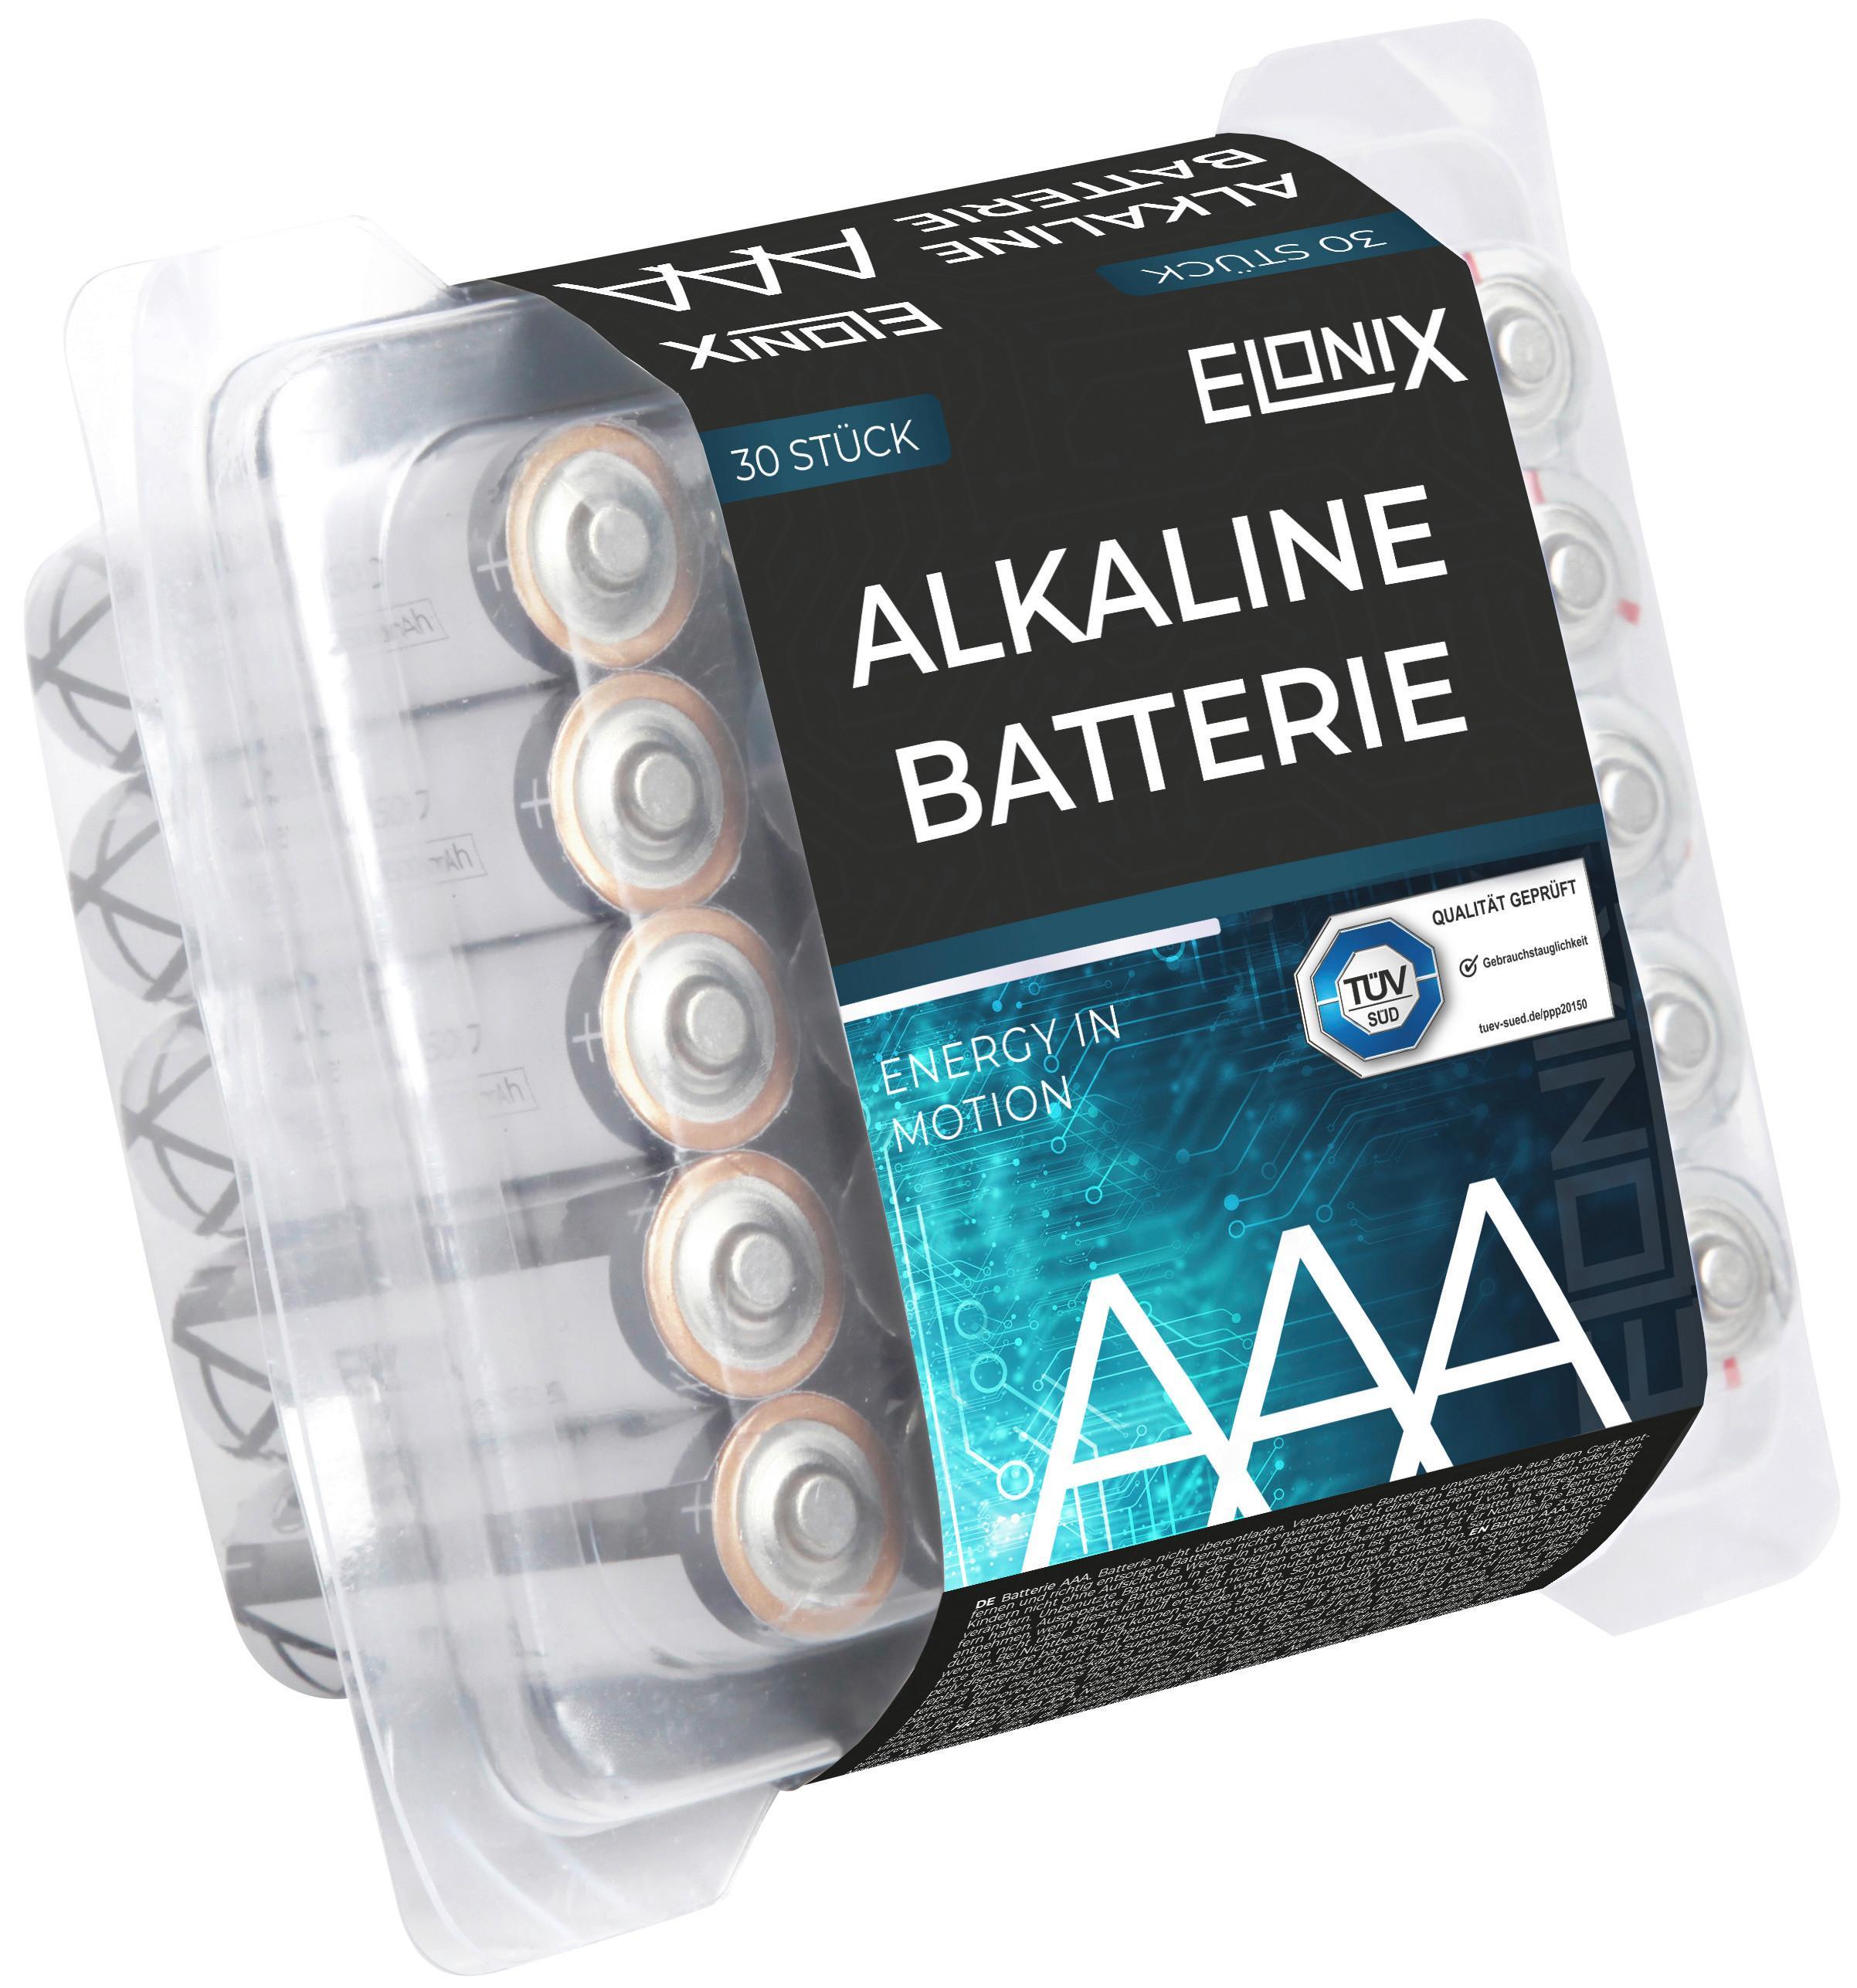 Image of Batterie Alkaline AAA 30er Packung